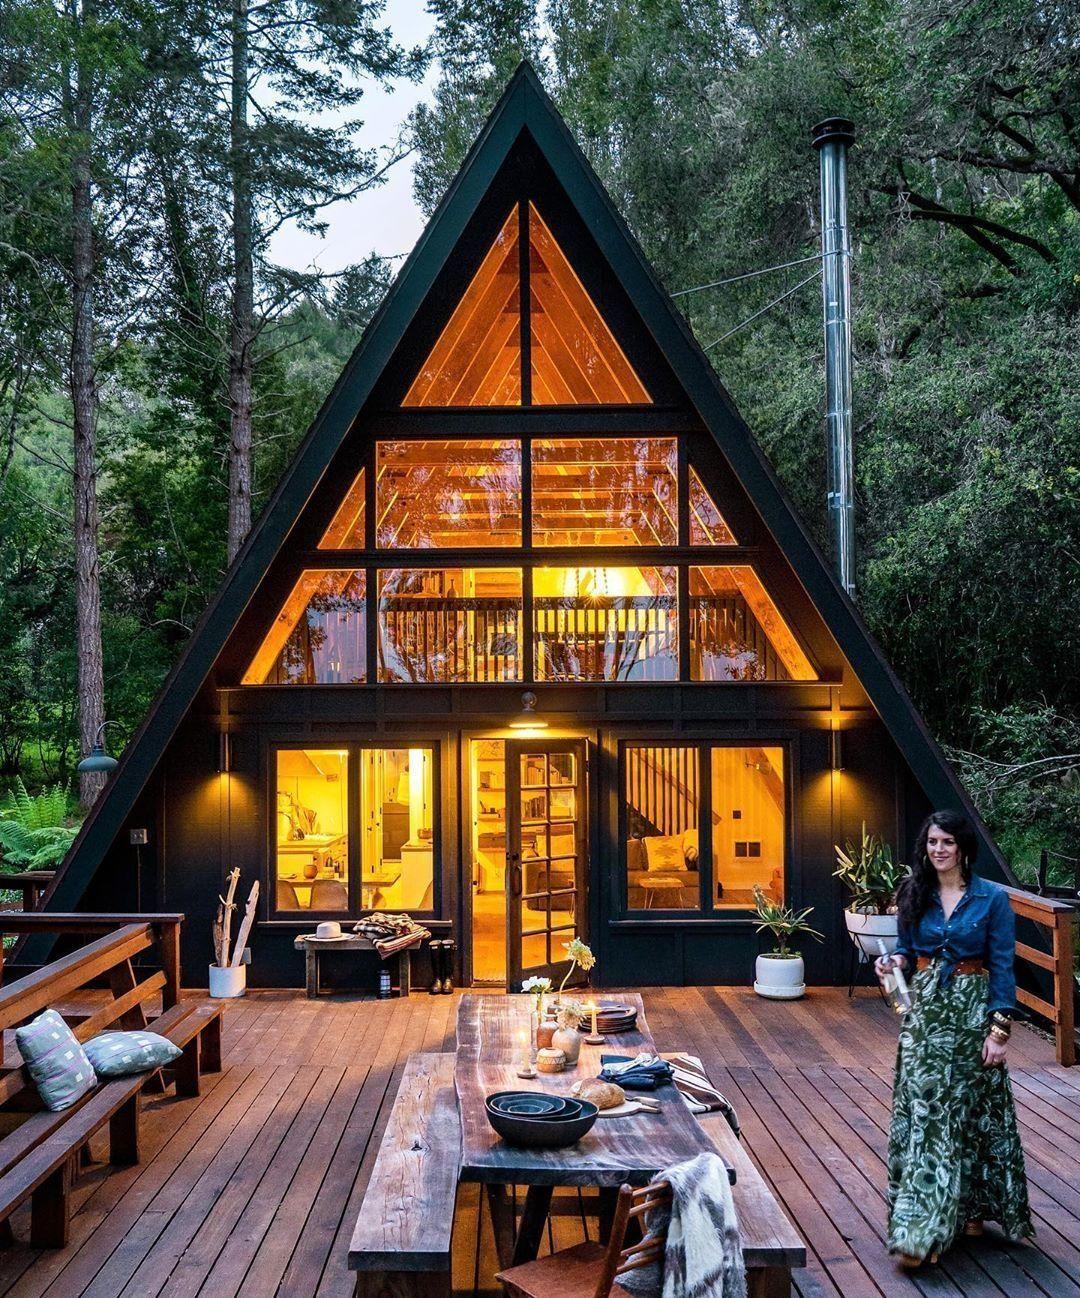 49 Beautiful Home Interior Cabin Style Design Ideas Cabin Style Homes Beautiful Houses Interior Cabin Style